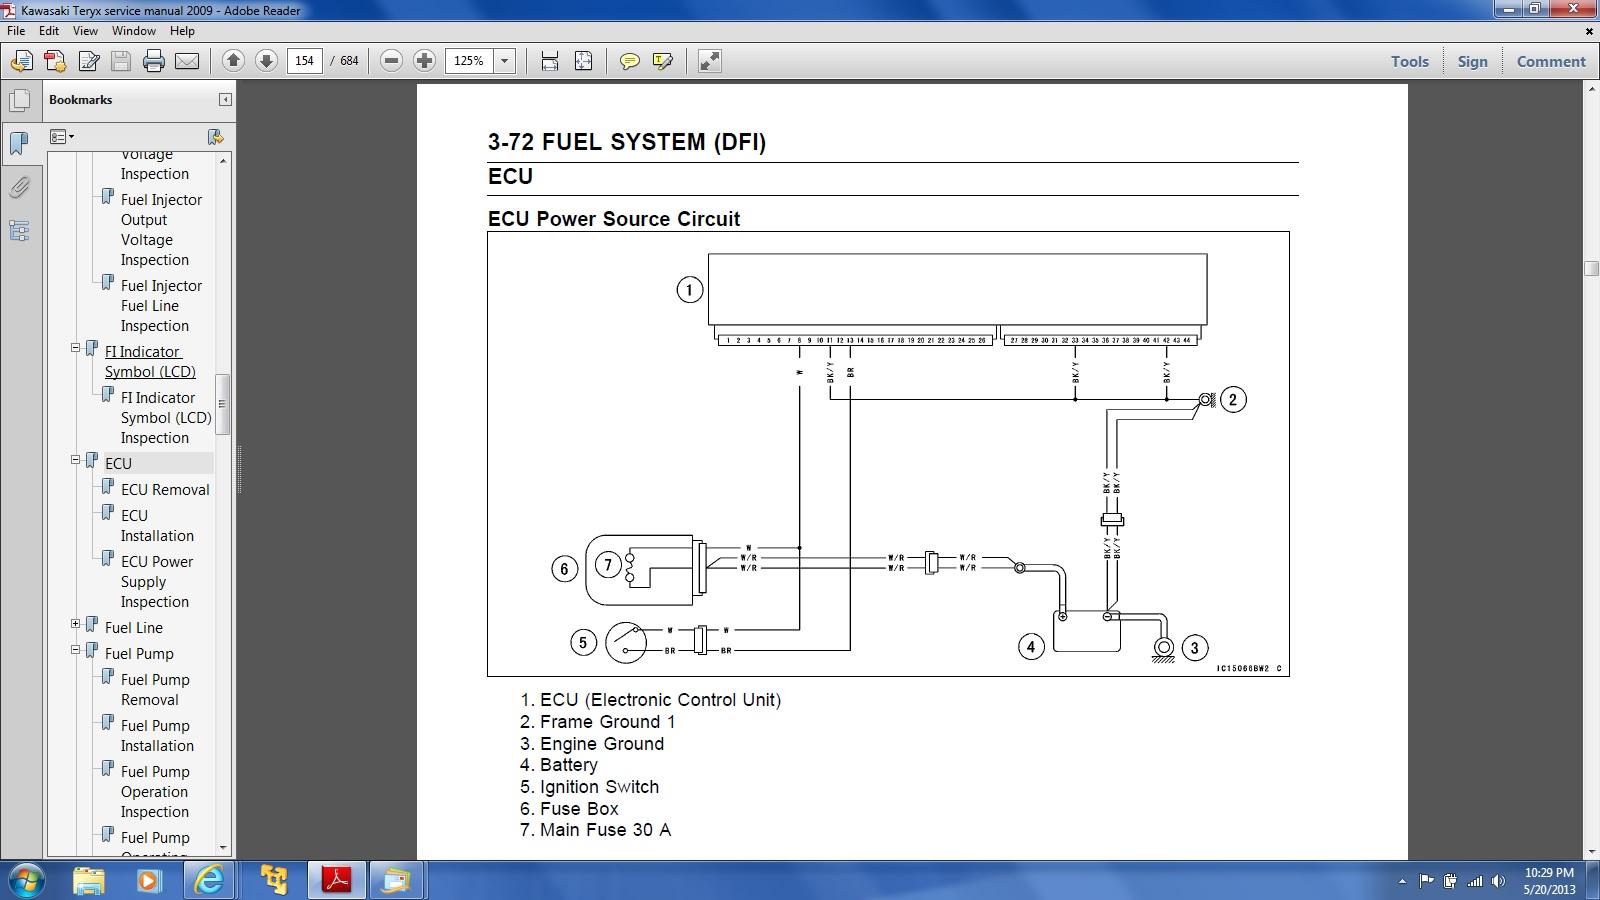 2011 Kawasaki Teryx Wiring Diagram